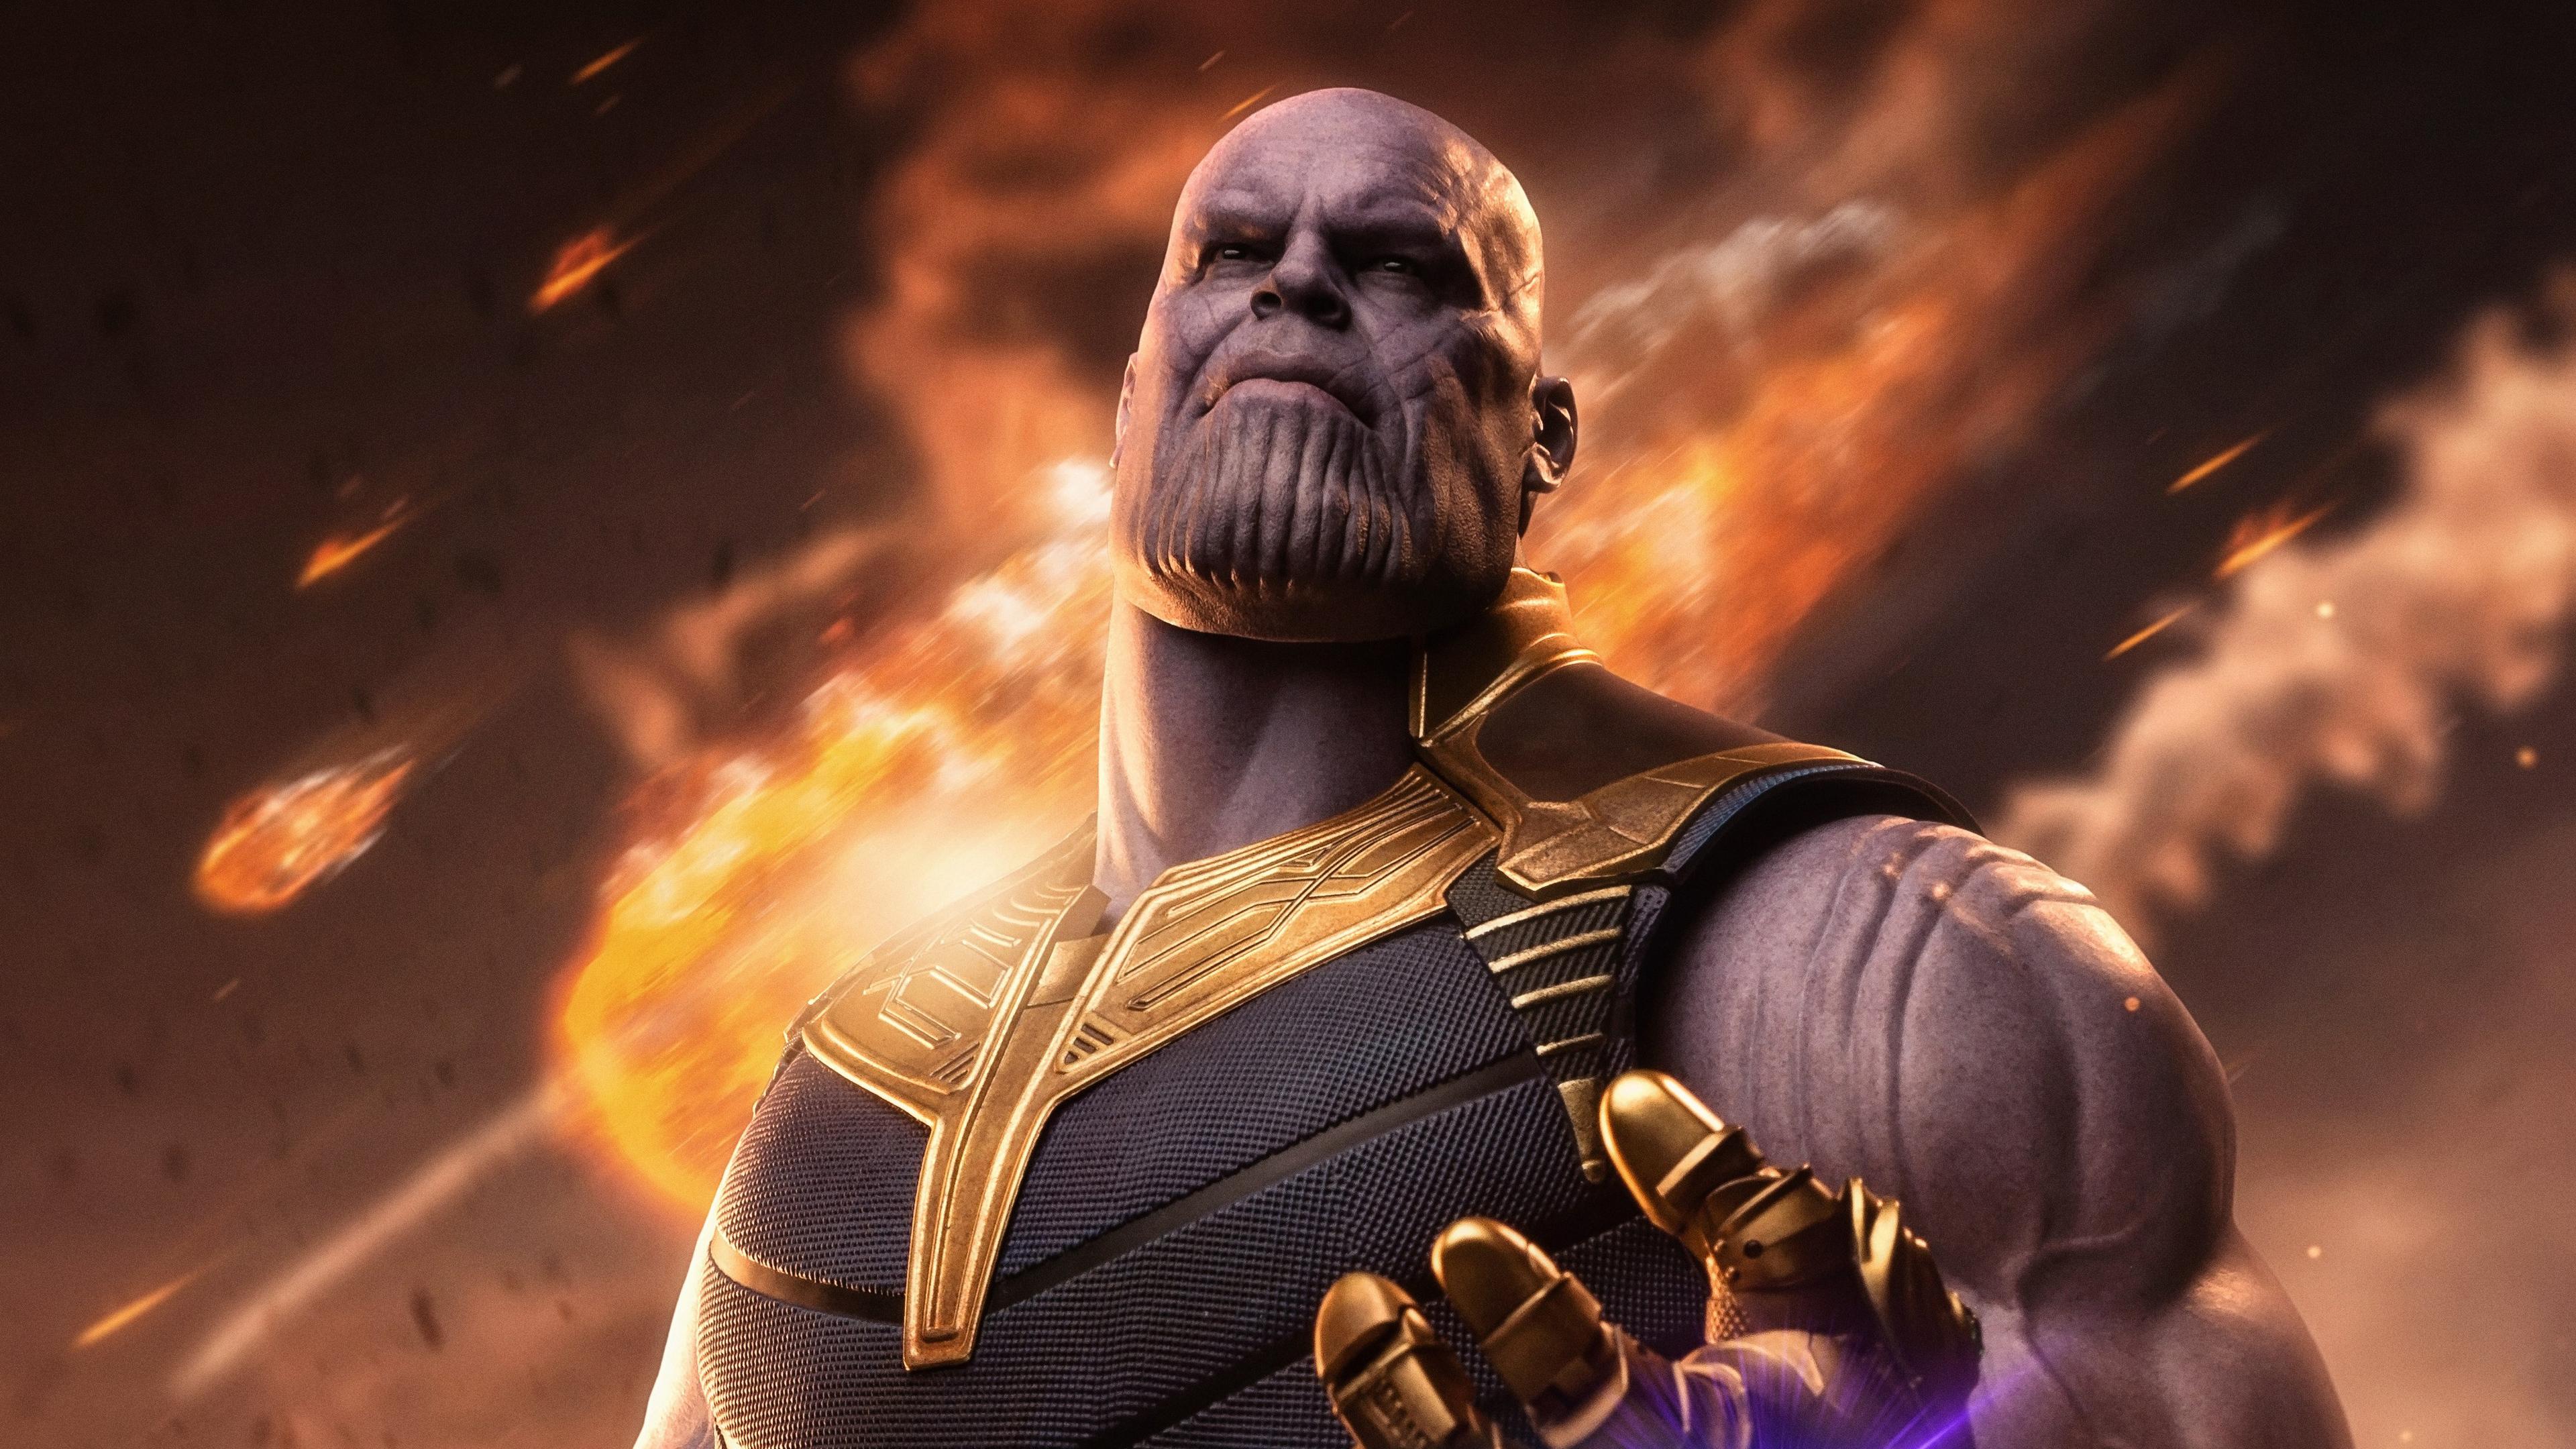 thanos new 4k 1553072176 - Thanos New 4k - thanos-wallpapers, superheroes wallpapers, hd-wallpapers, digital art wallpapers, artwork wallpapers, 4k-wallpapers